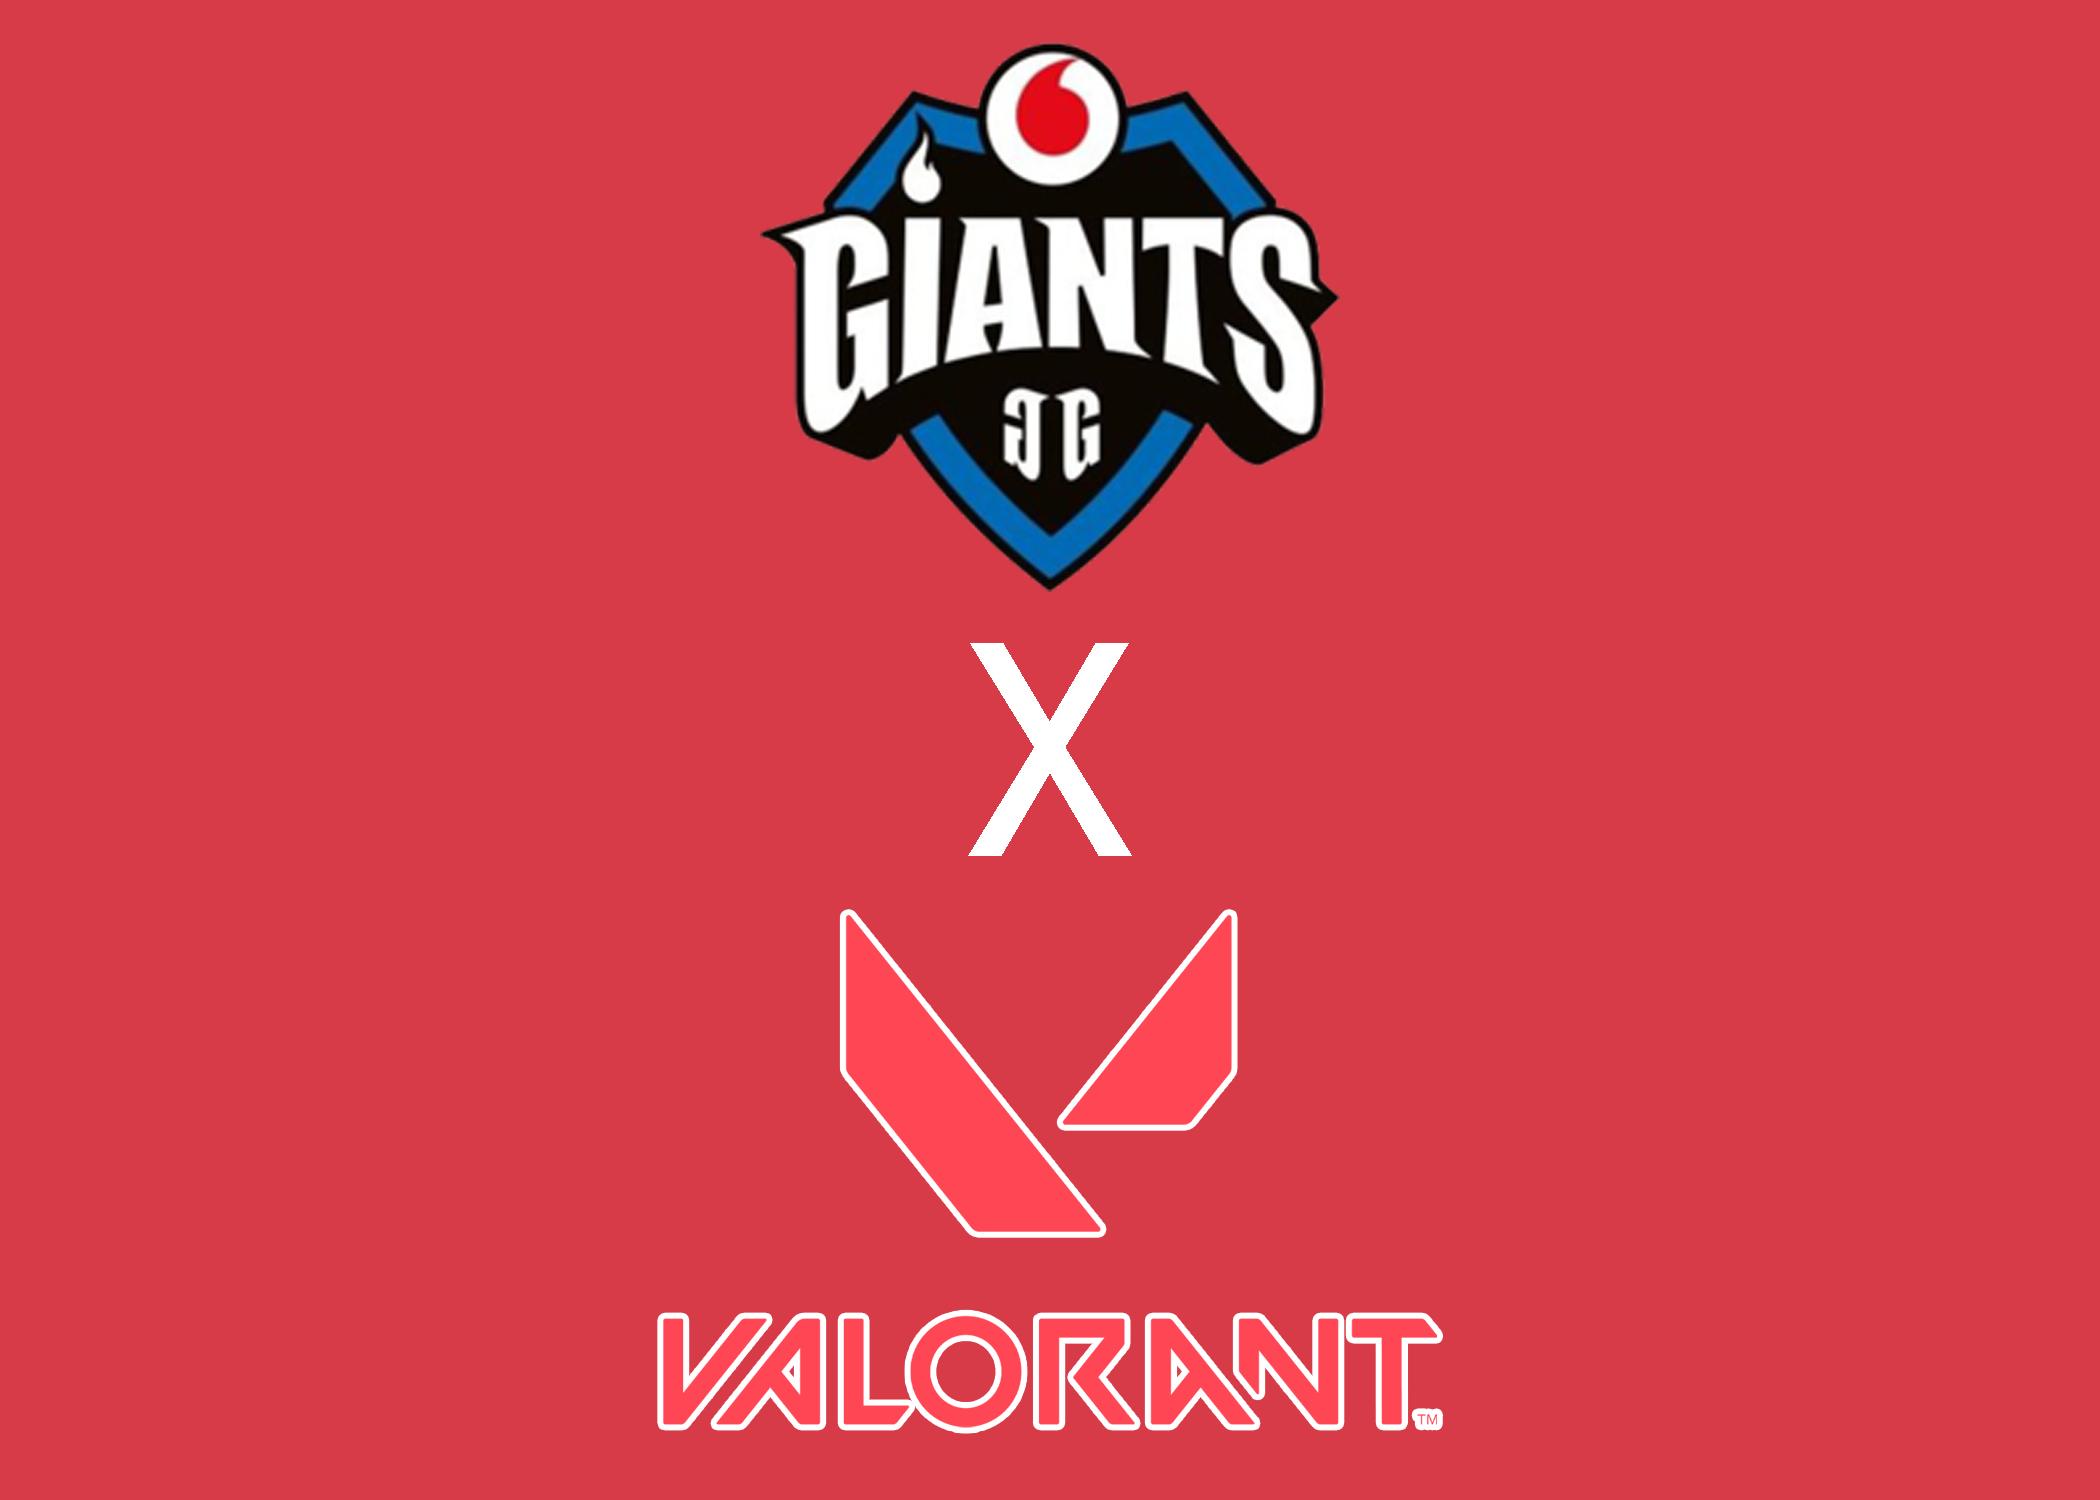 Vodafone Giants announce Valorant roster